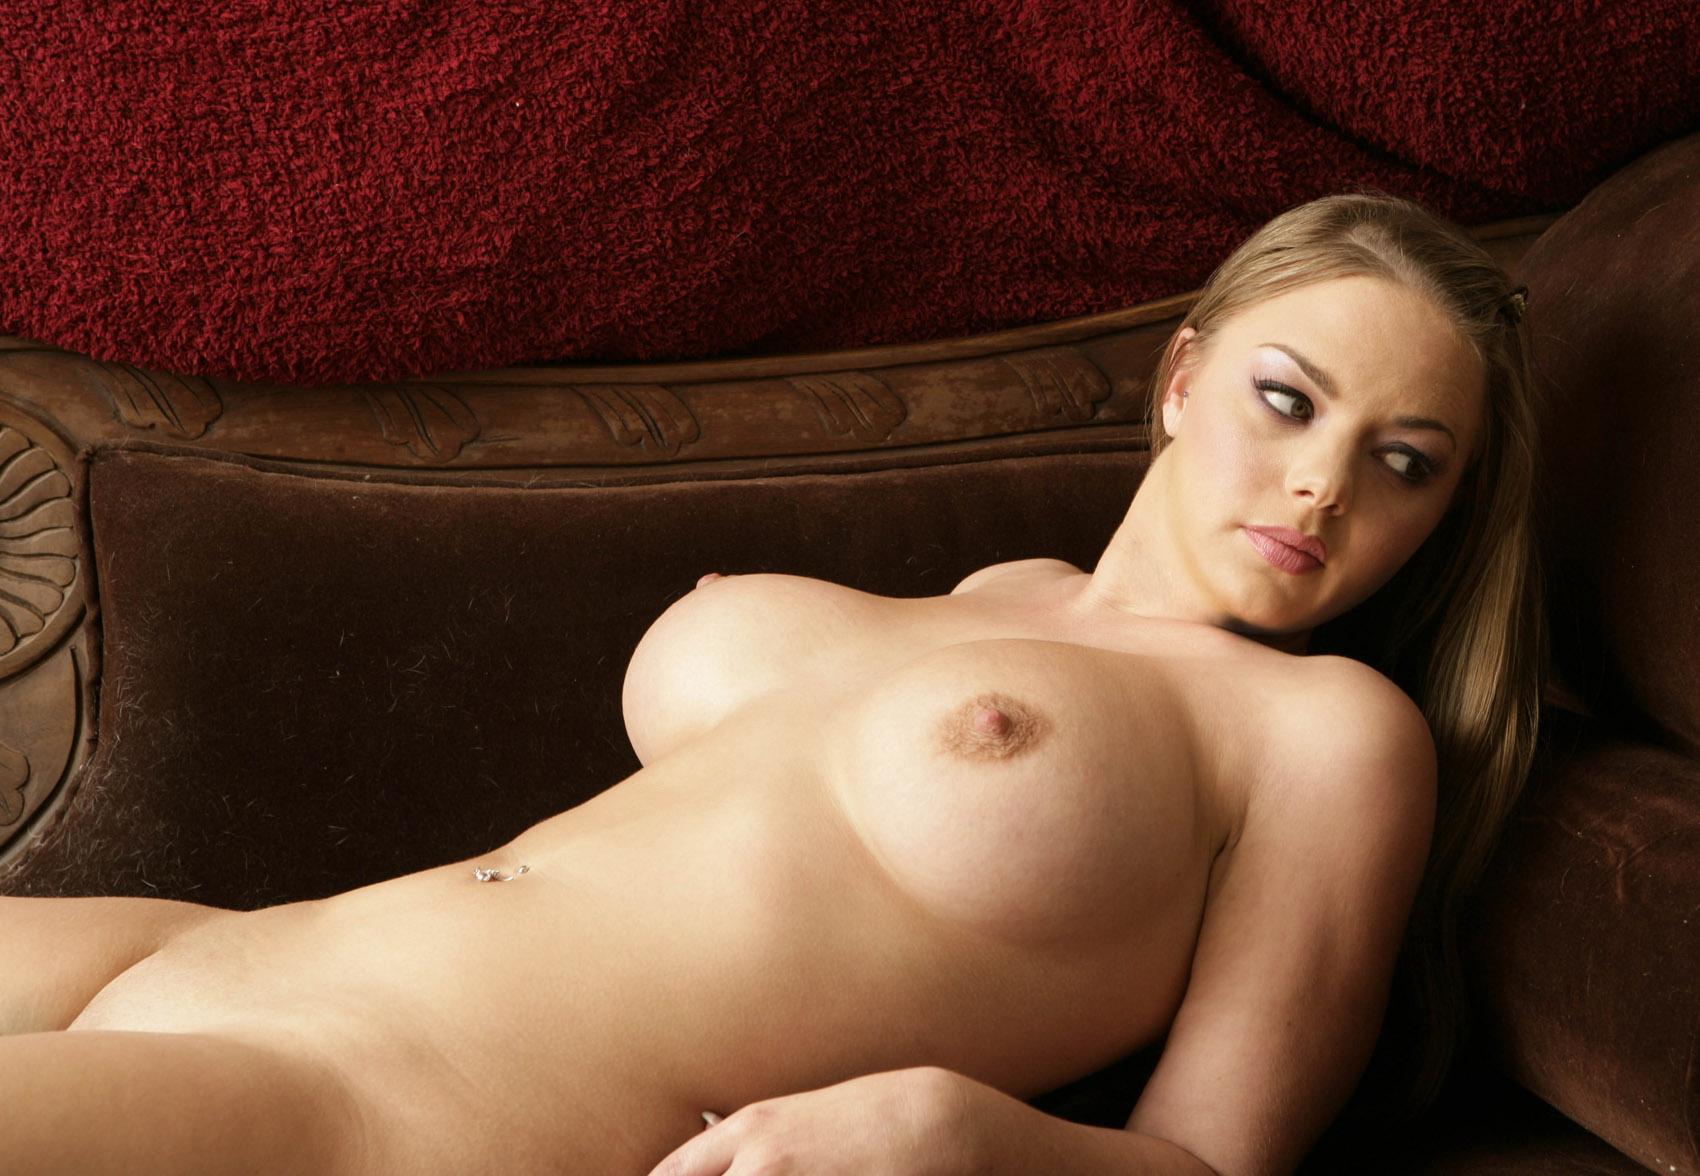 Nude home nipples puffy